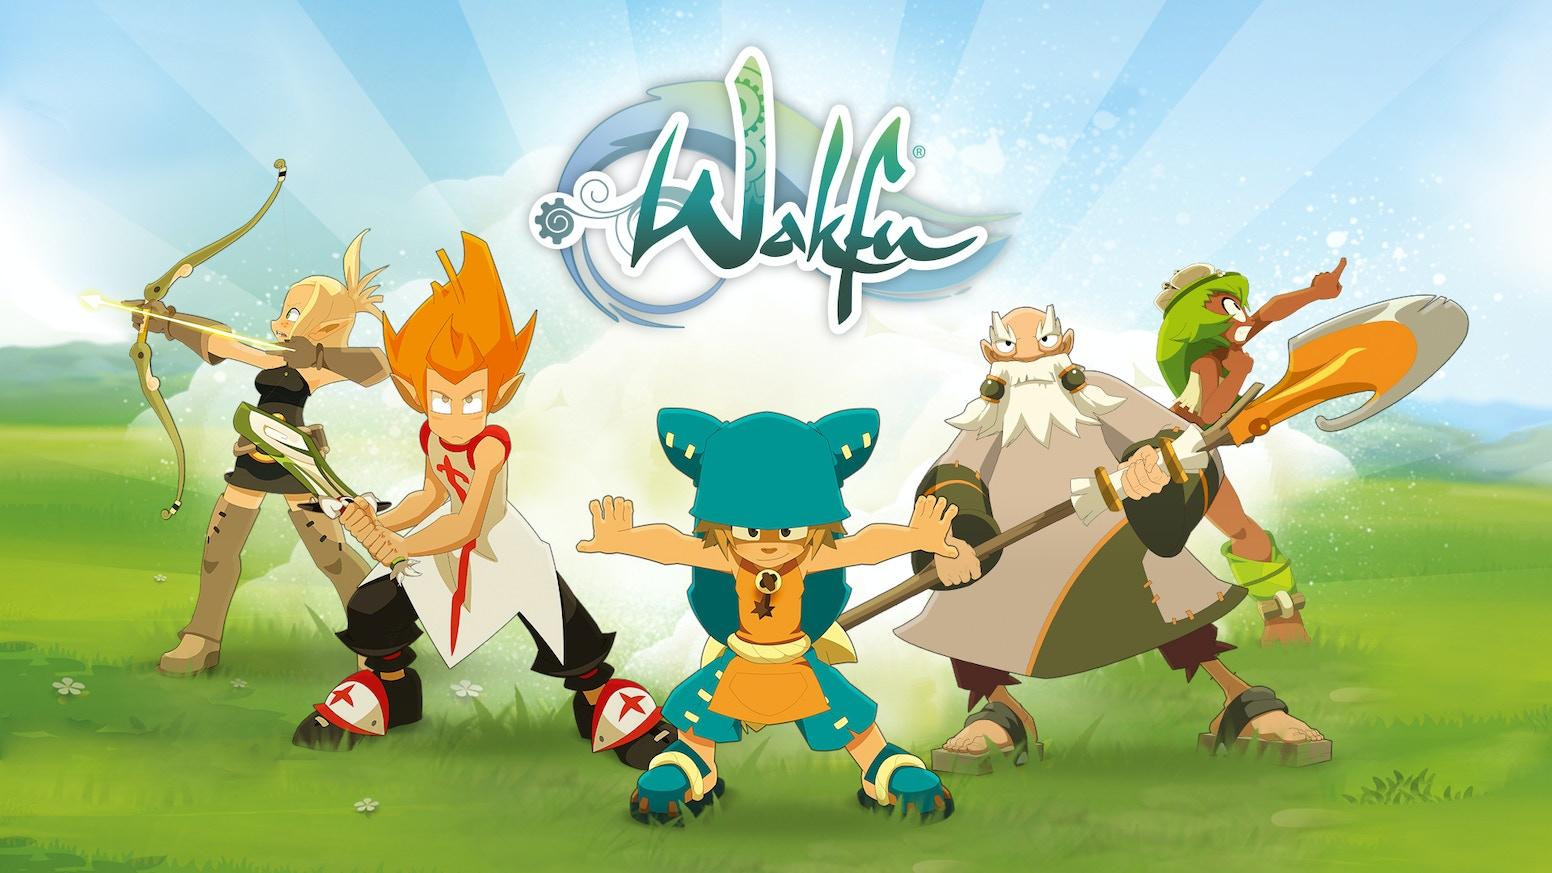 WAKFU: The Animated Series by Ankama — Kickstarter